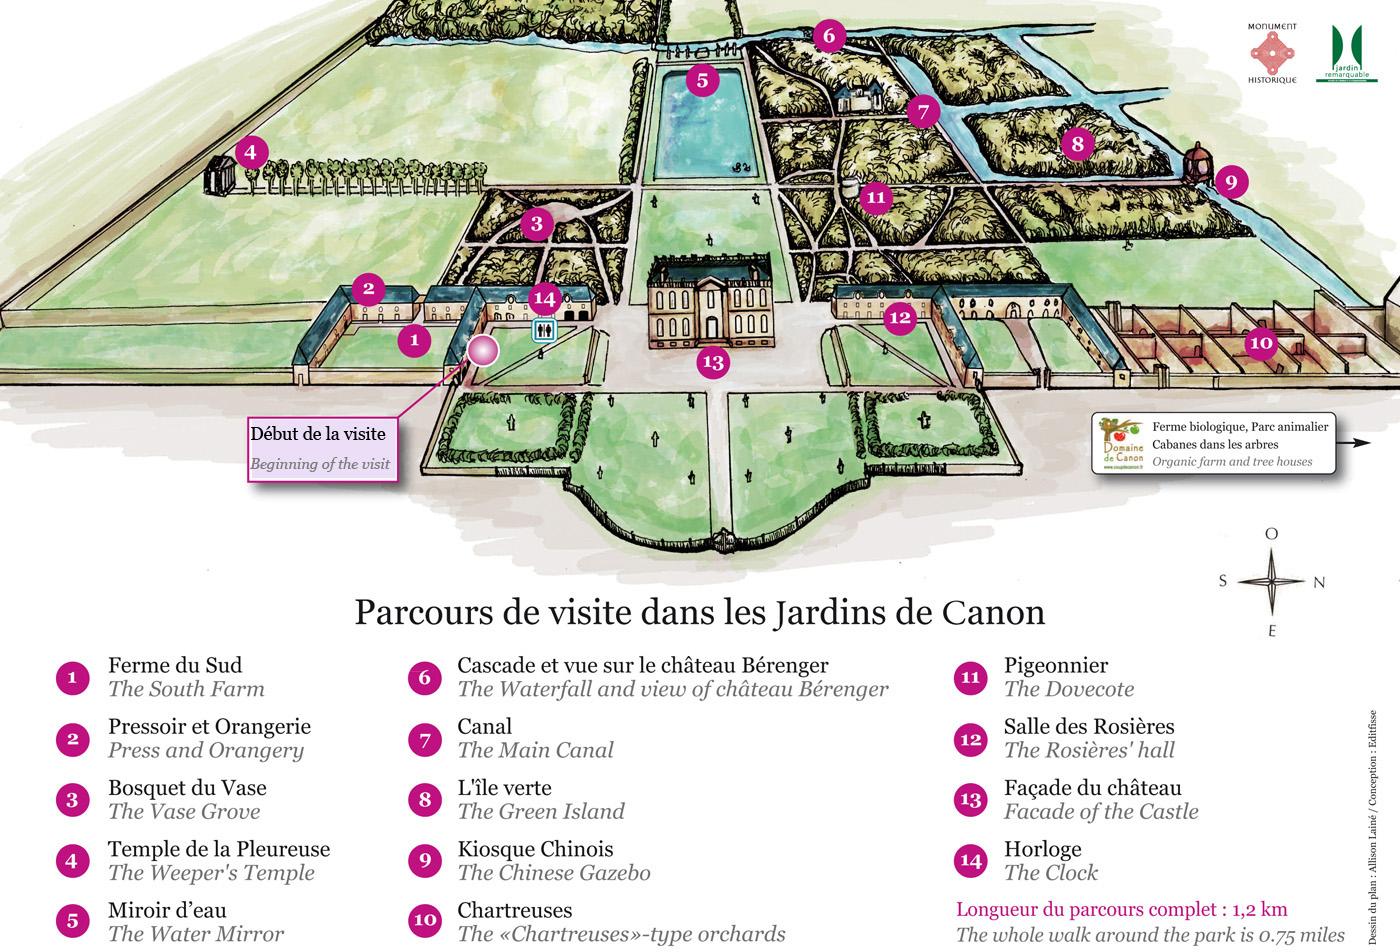 Plan jardin anglais elegant heering jpg with plan jardin for Jardin anglais fontainebleau